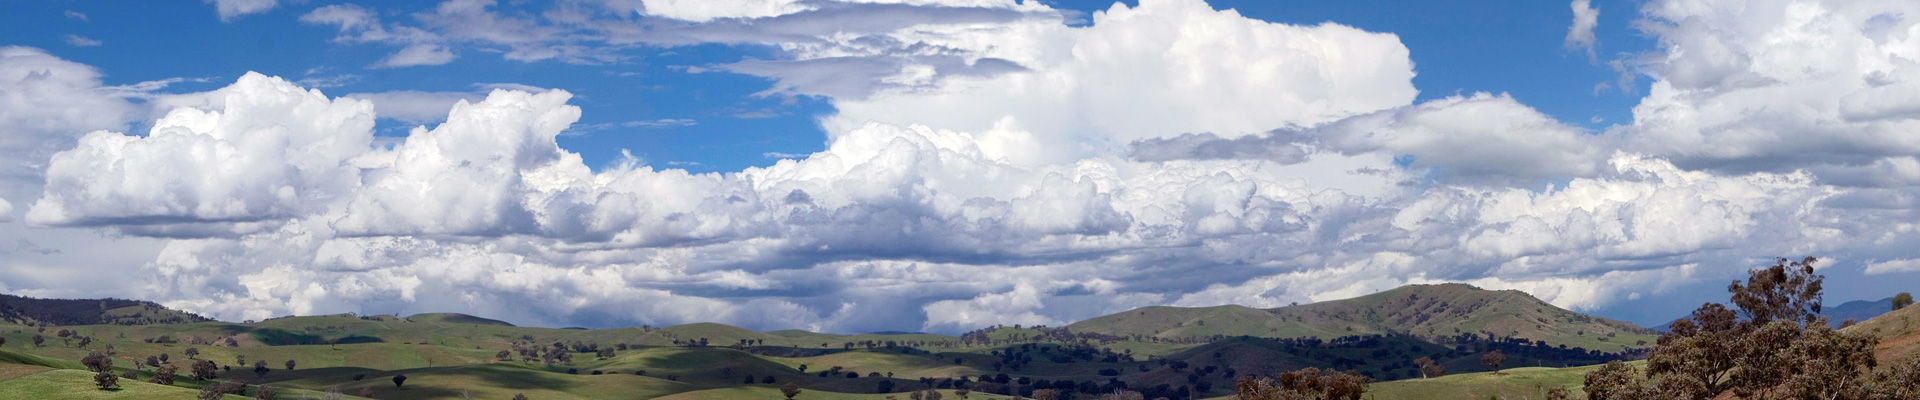 Sepbanner 2017 Cloud